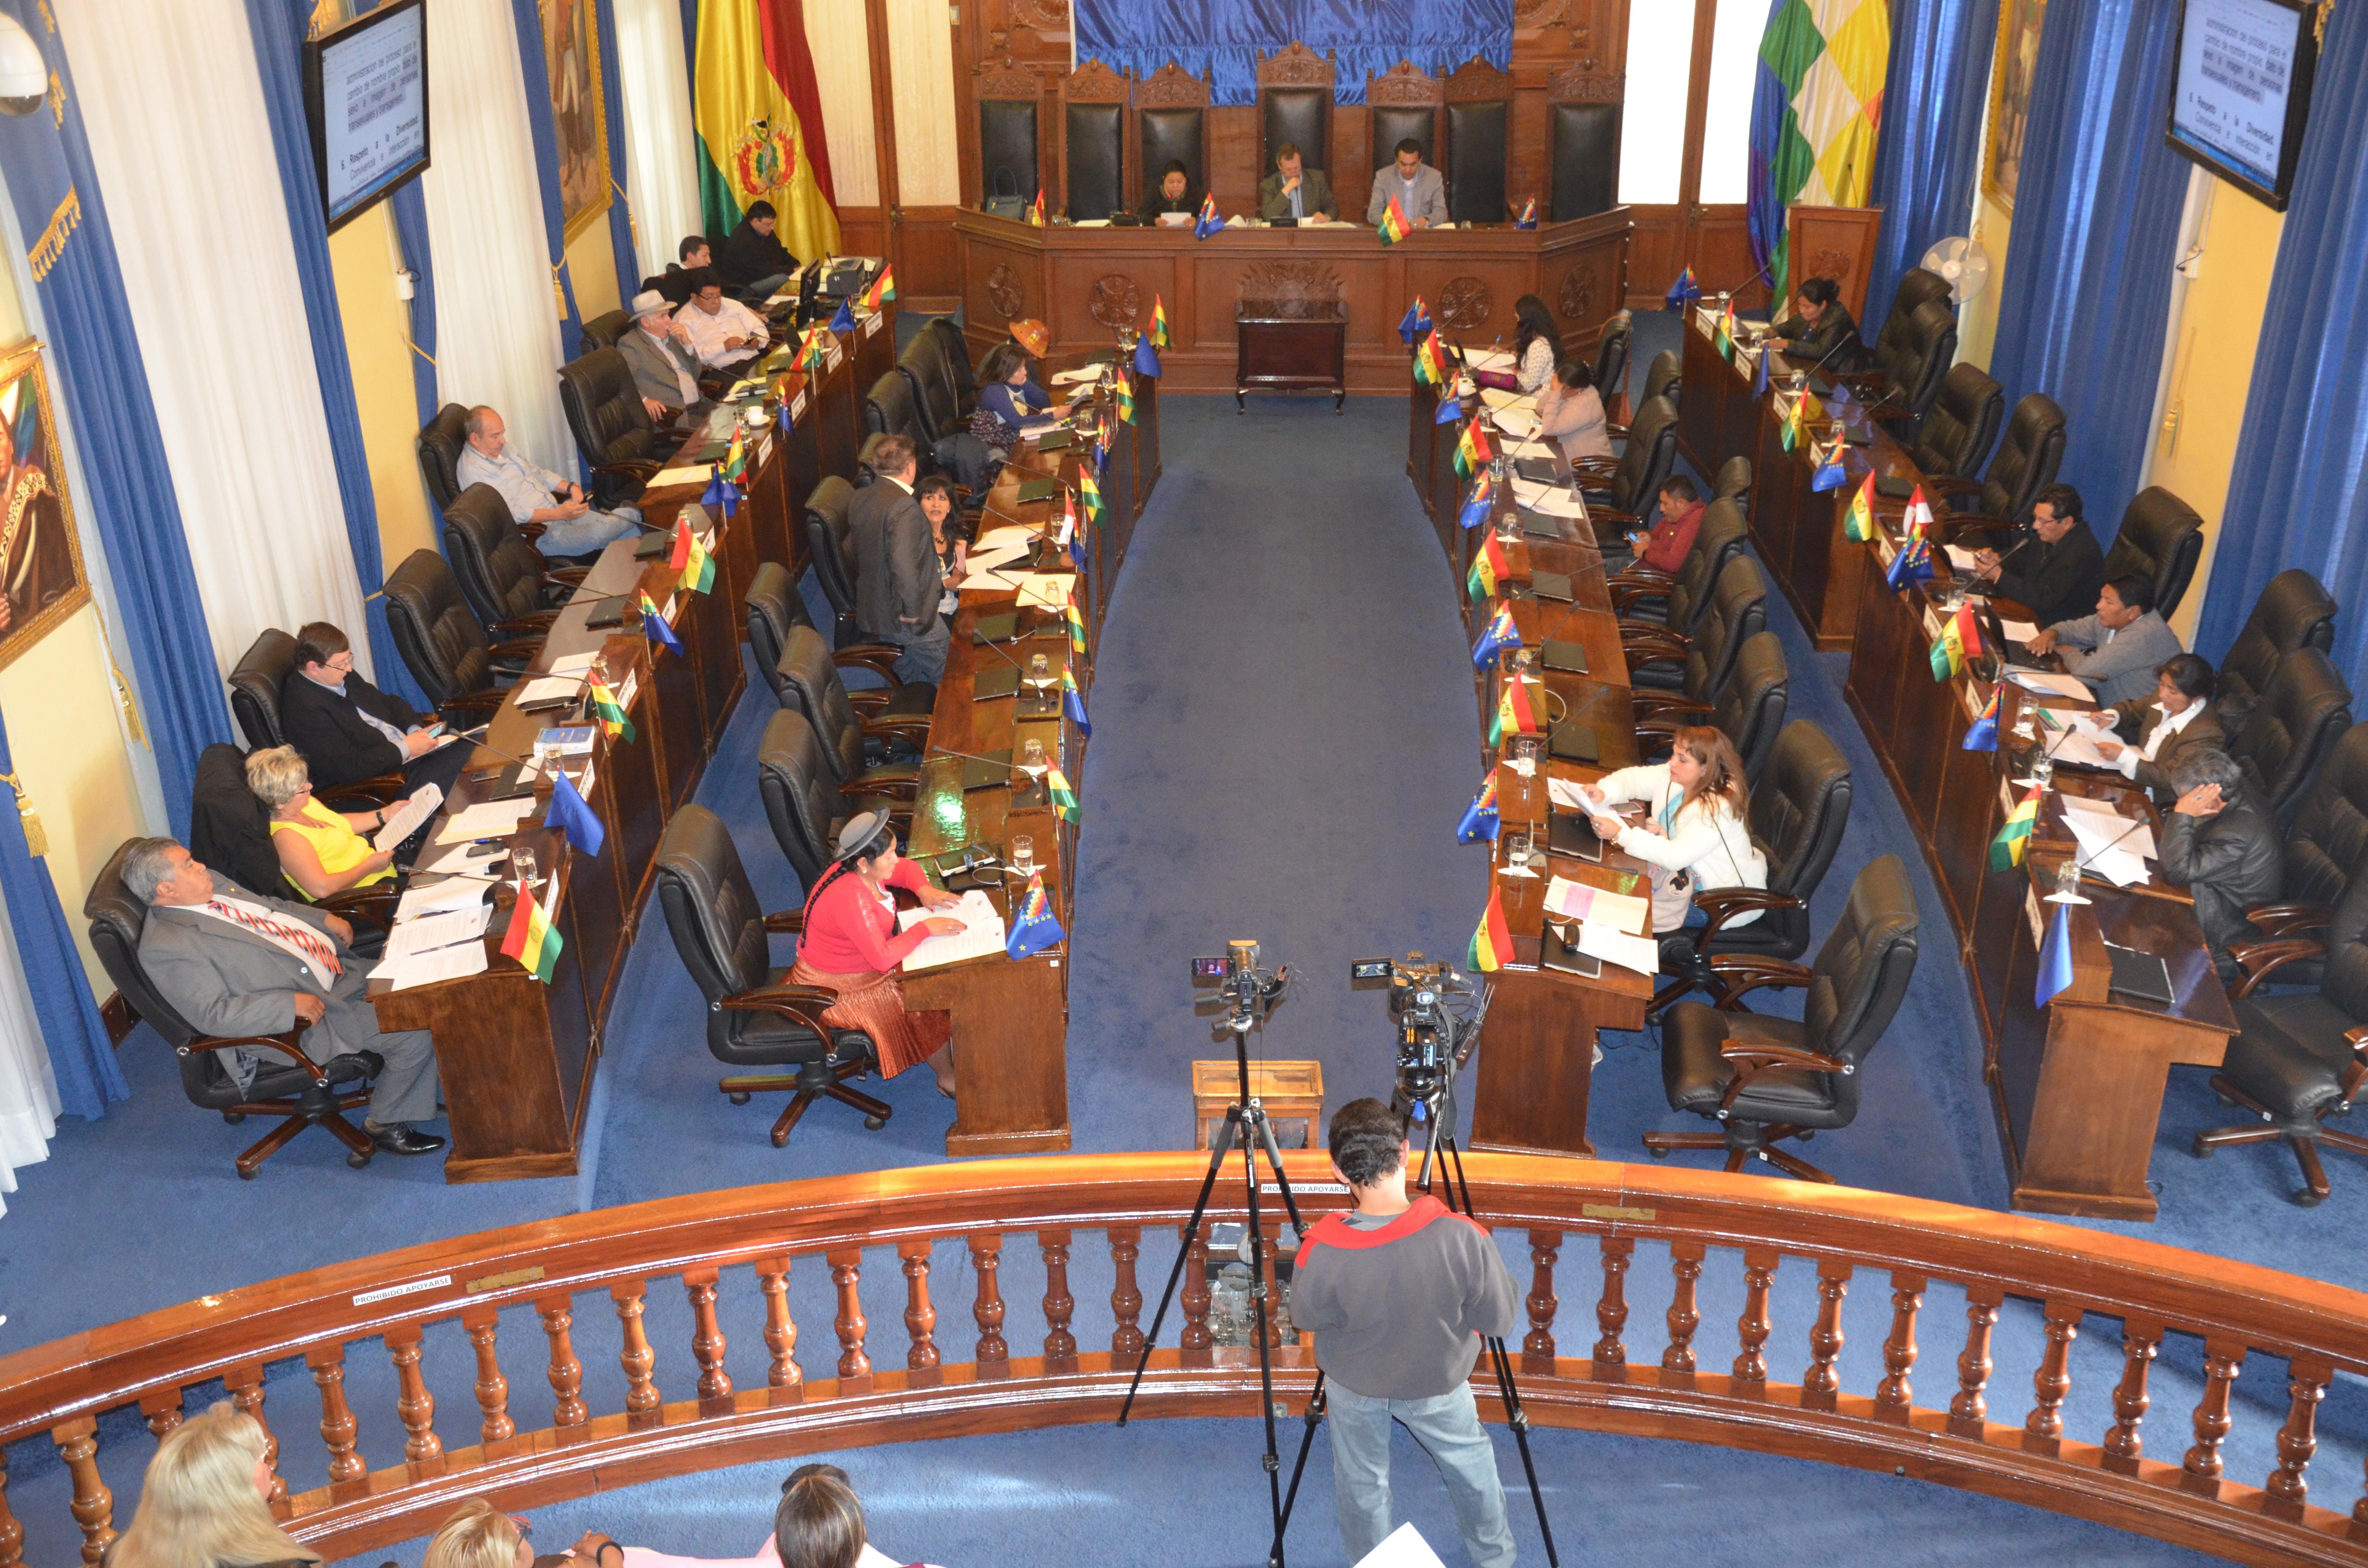 Senado aprueba homenaje a la Escuela Taller Sucre